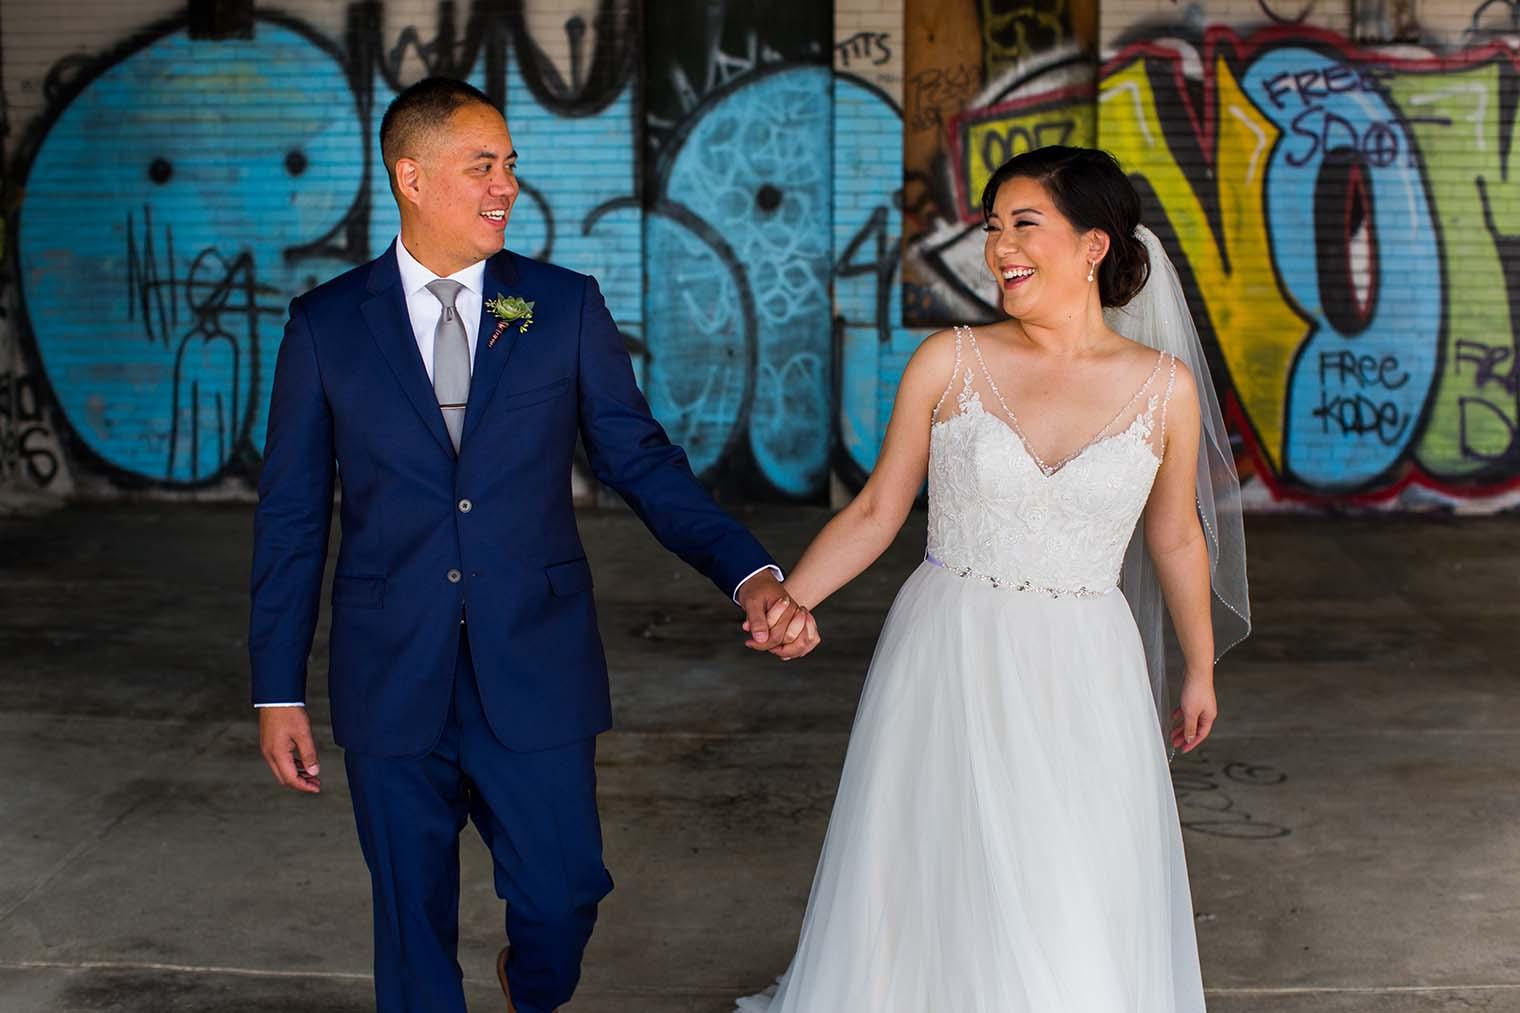 16th Street Station Wedding Photography